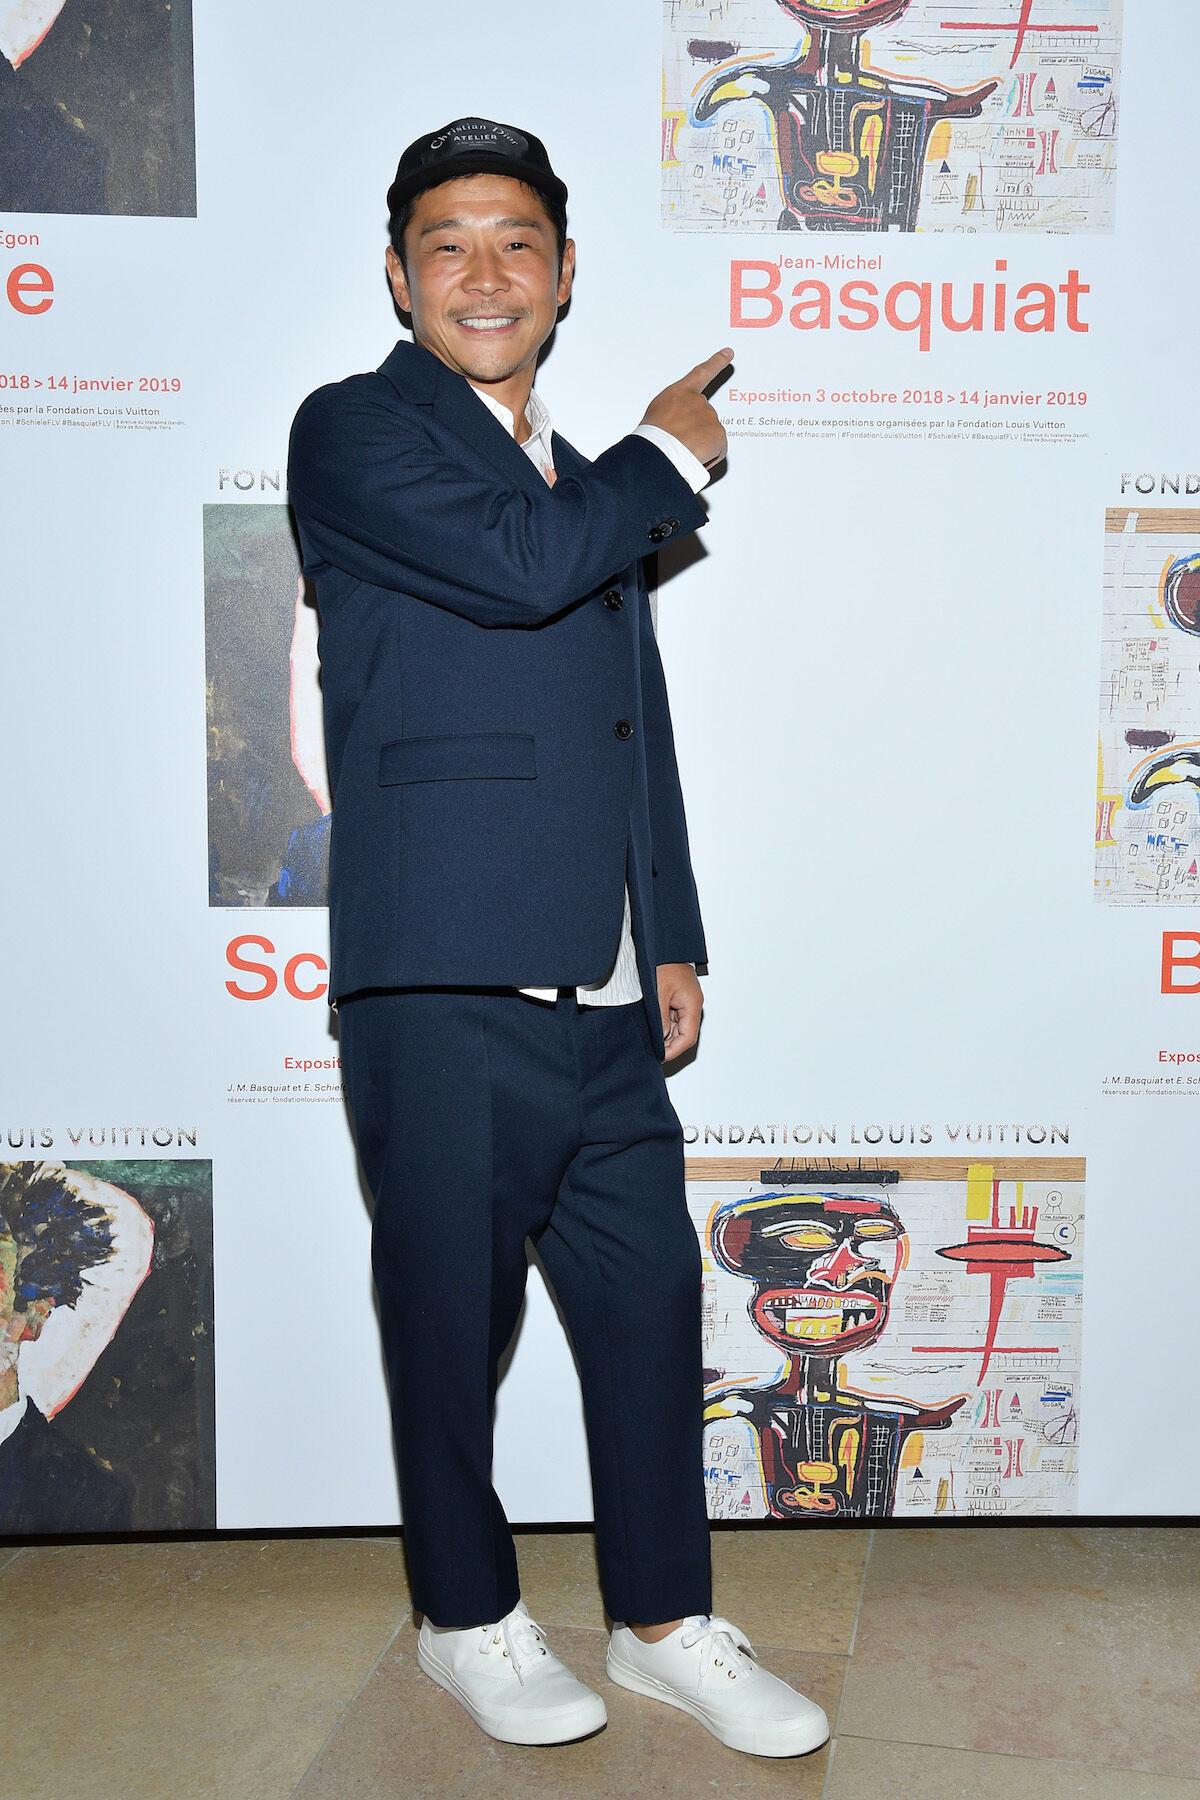 Yusaku Maezawa at the Louis Vuitton Foundation. Photo by Pascal Le Segretain/Getty Images.